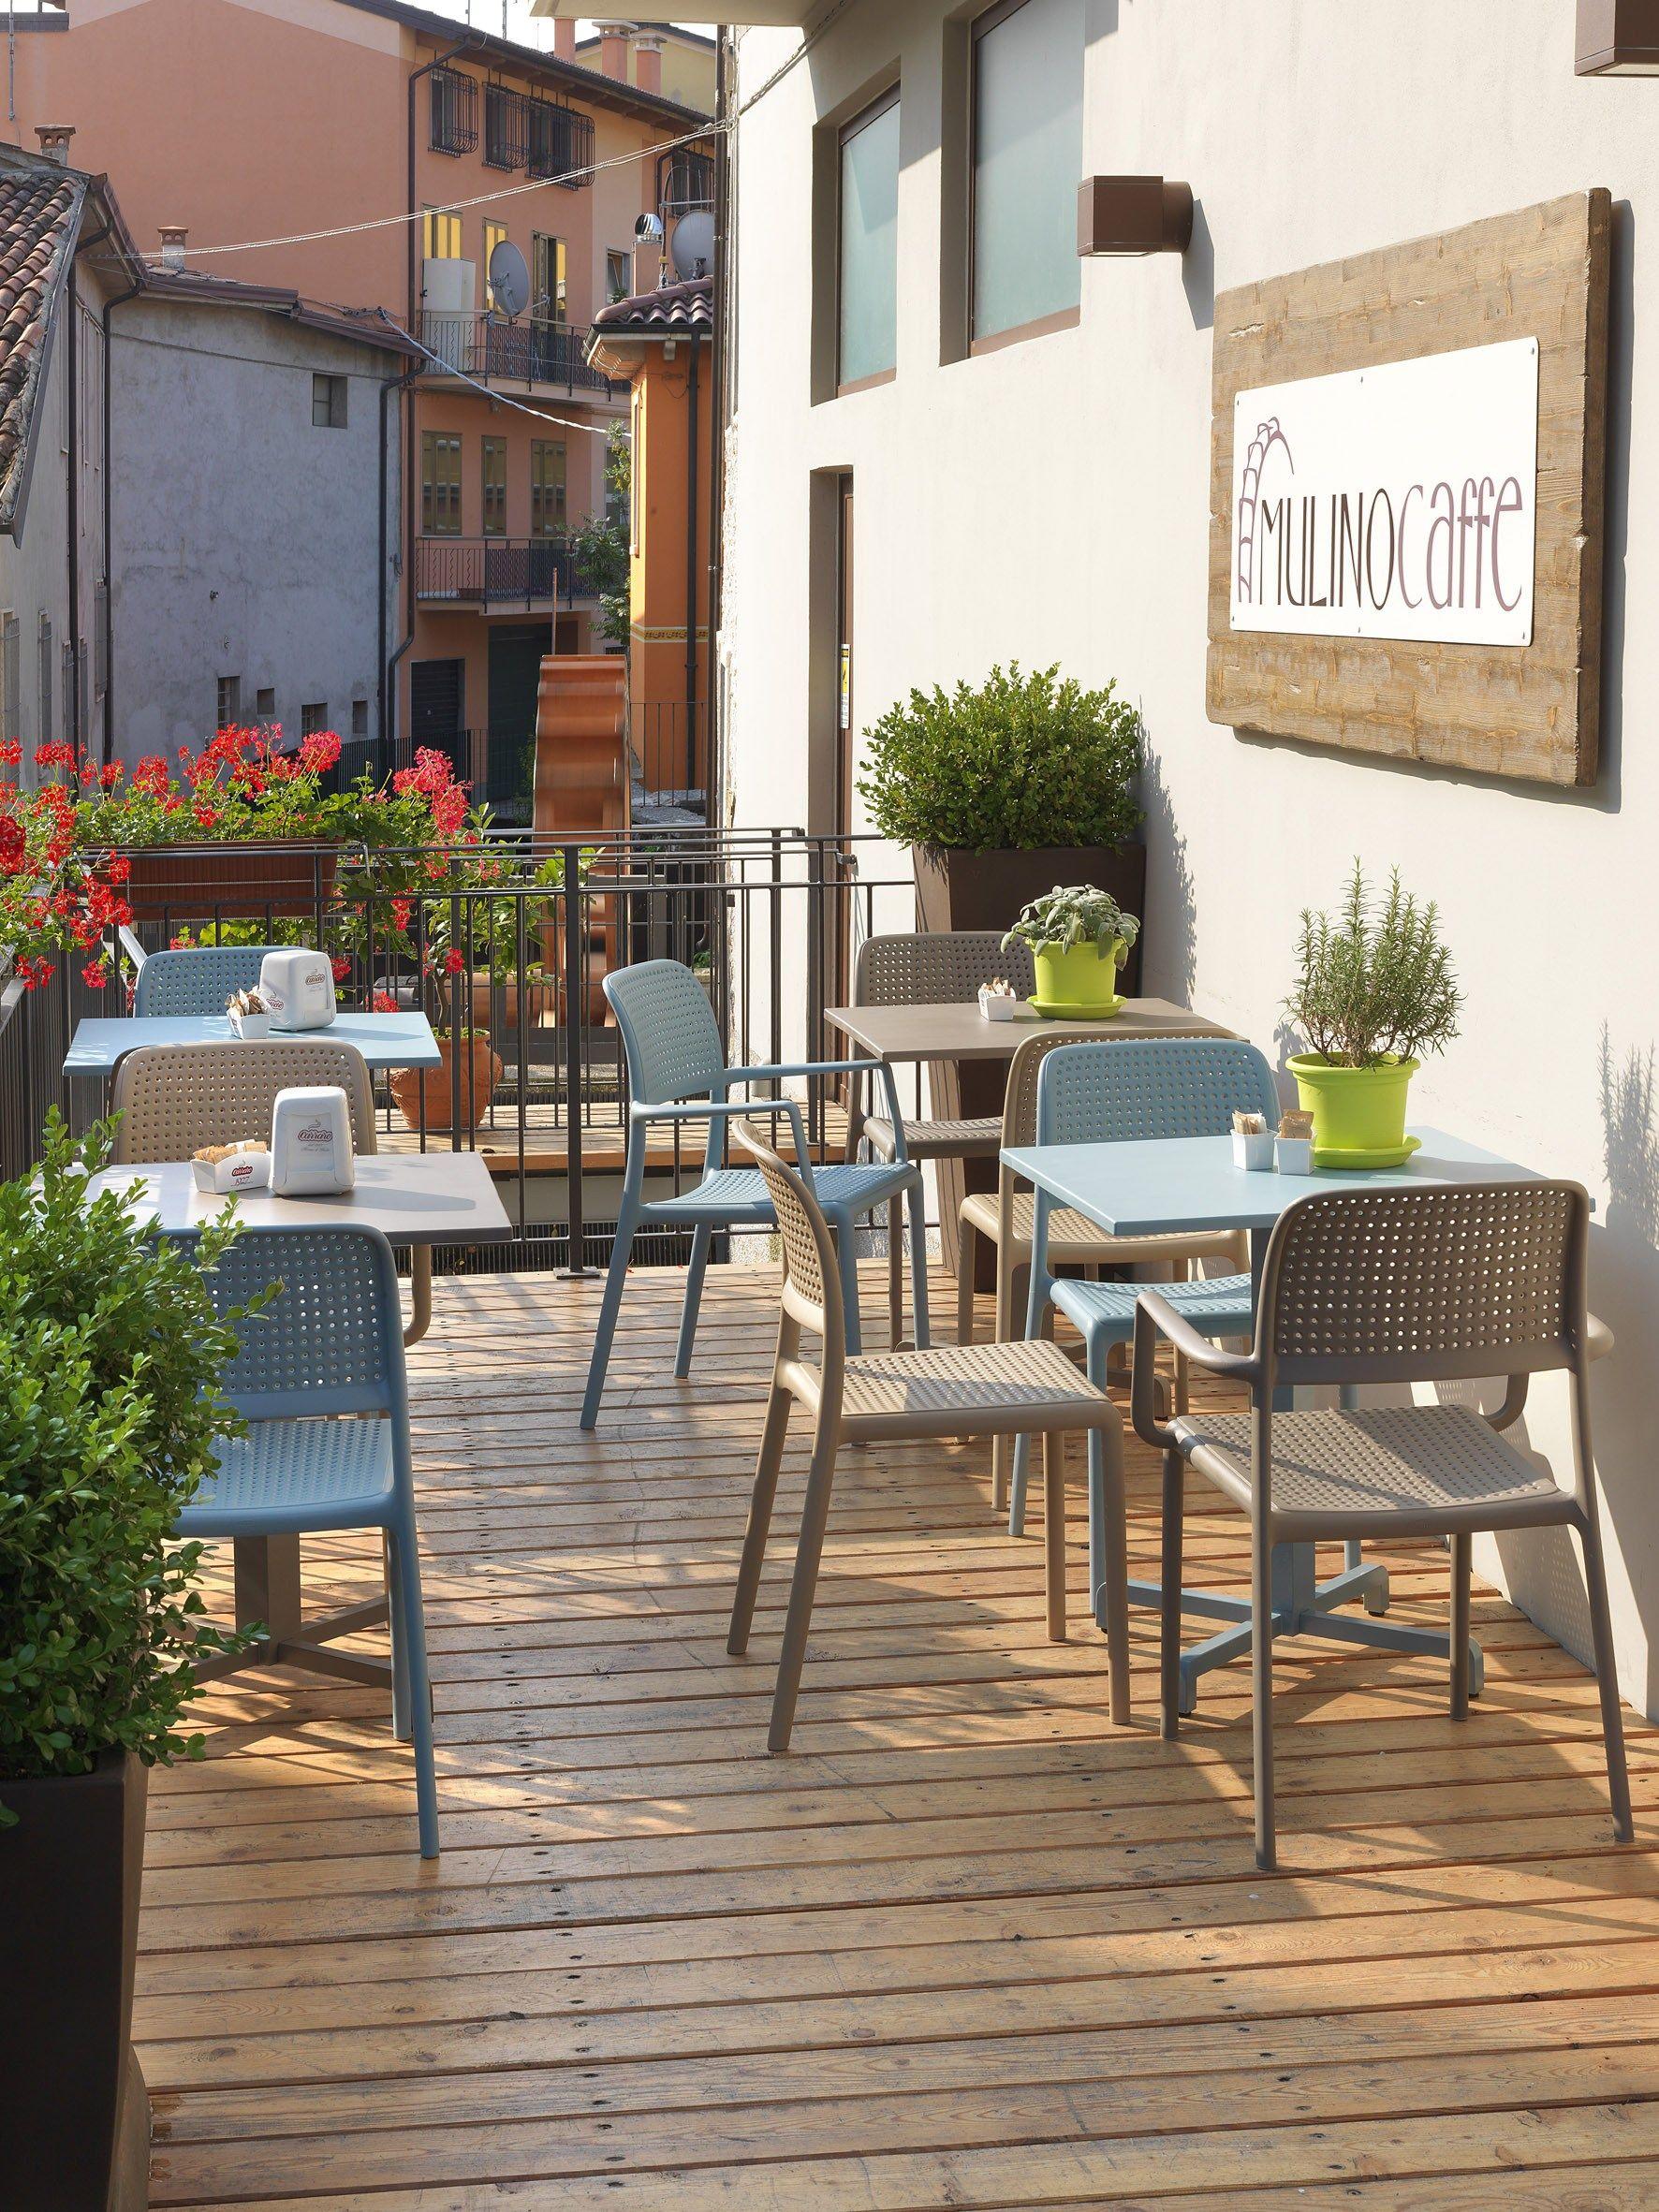 Sillón De Plástico Para Restaurante Y Terraza De Hostelería